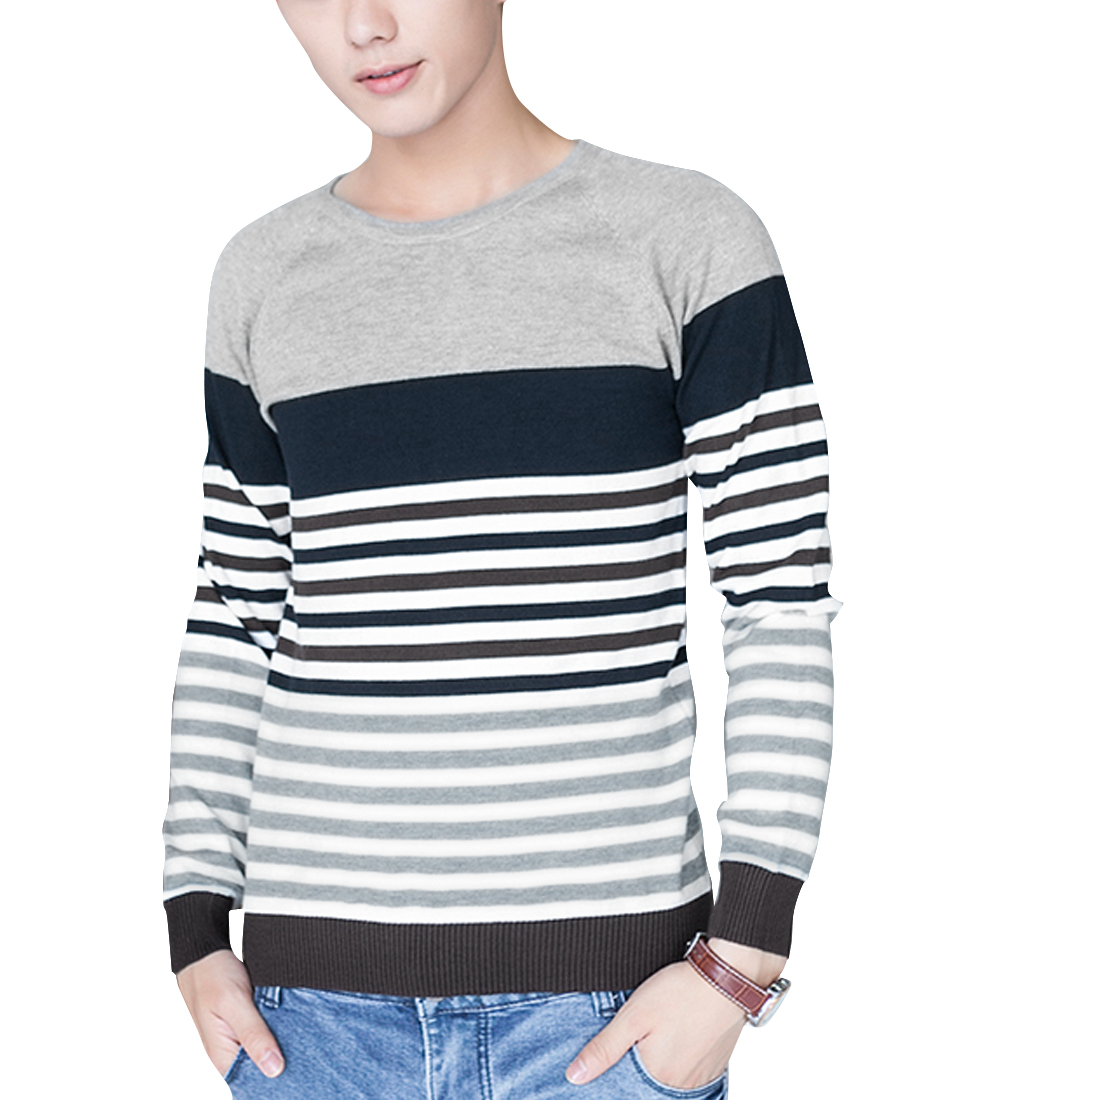 Men Pullover Long Sleeve Stripes Knitwear Navy Blue Light Gray S